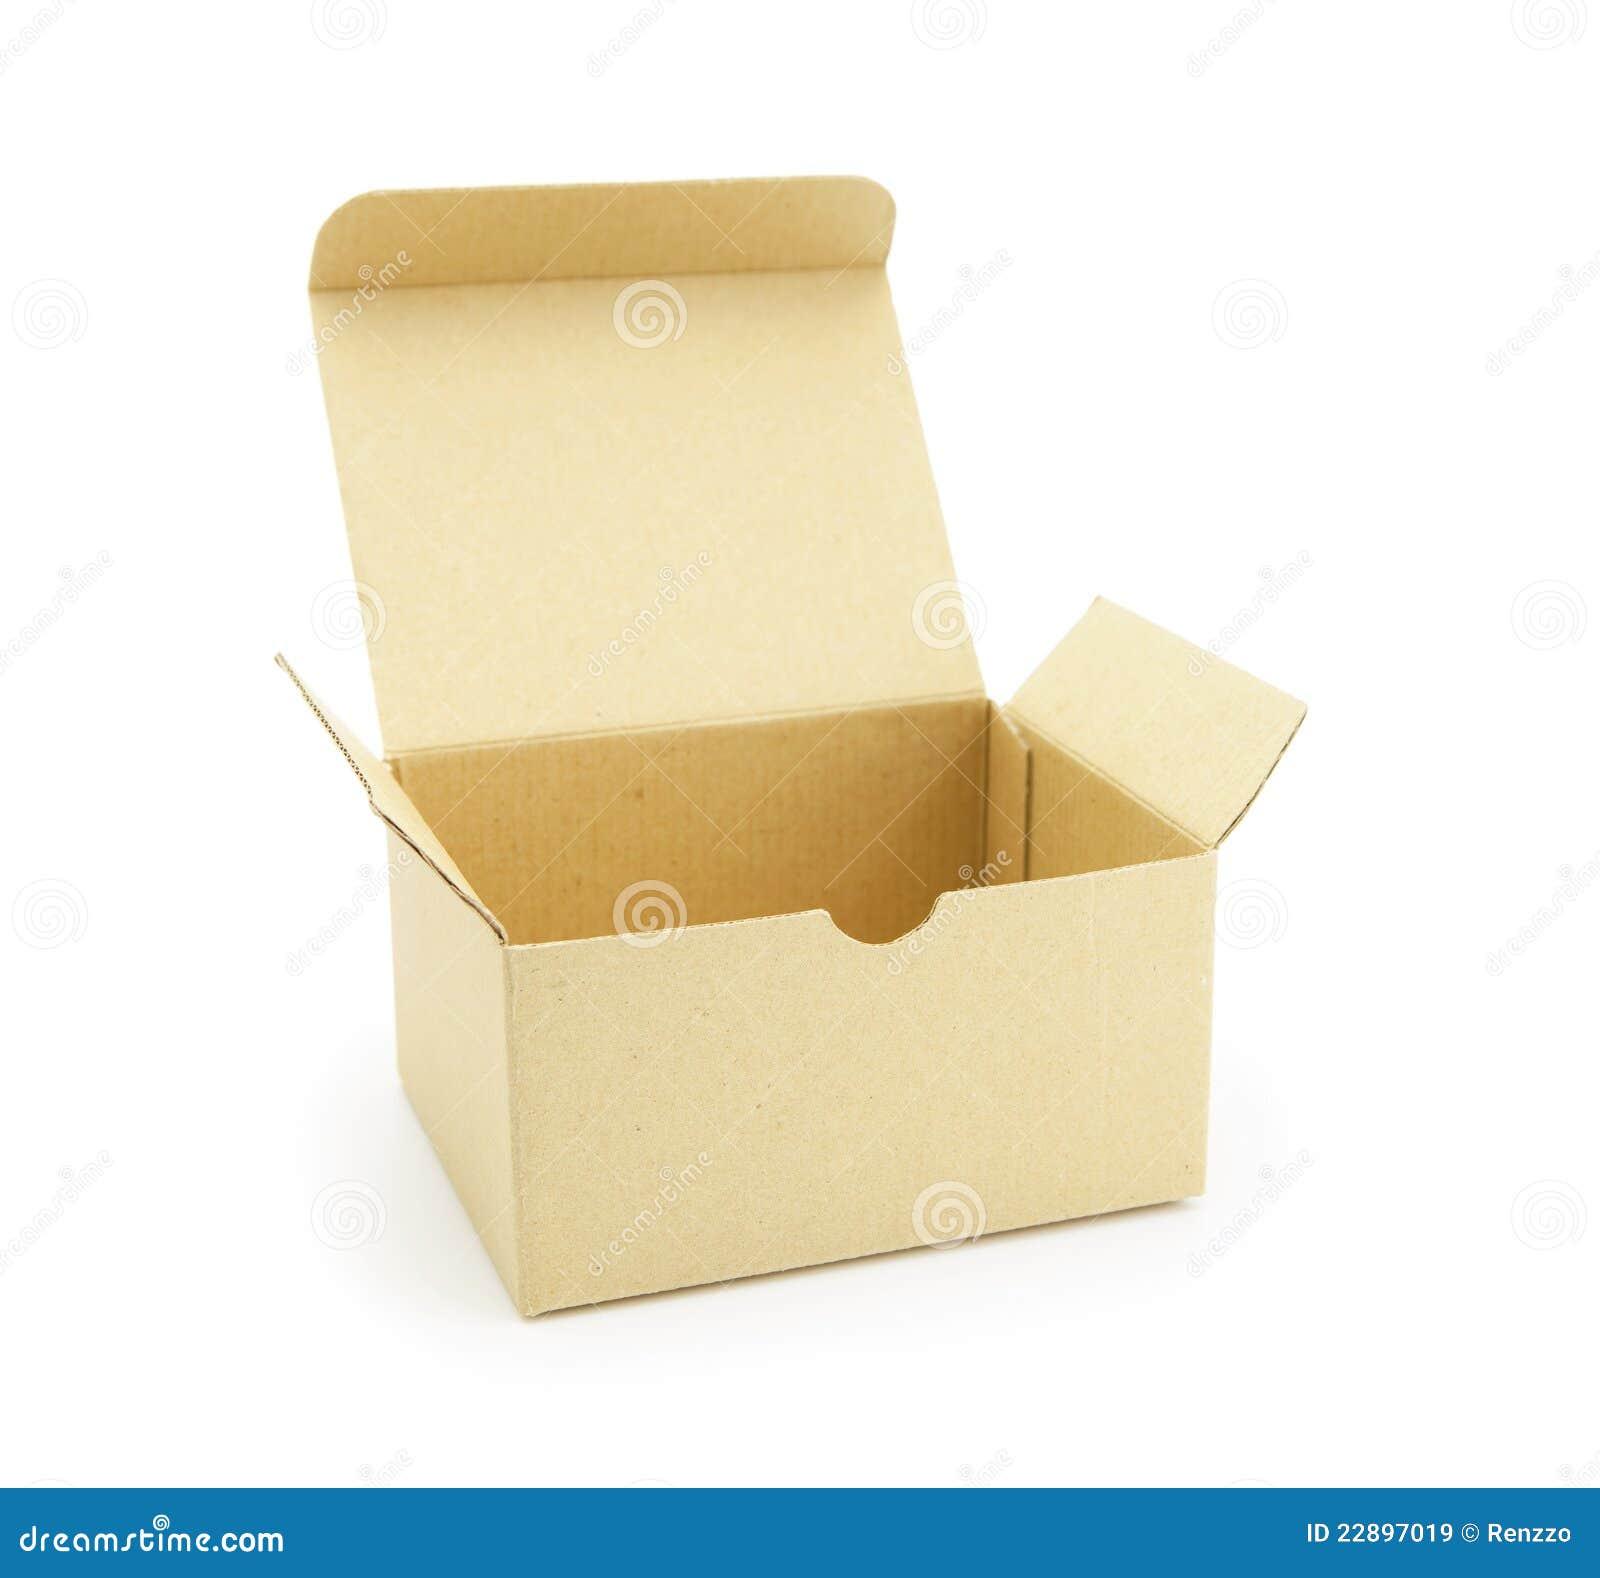 cardboard box with flip open lid stock image image 22897019. Black Bedroom Furniture Sets. Home Design Ideas